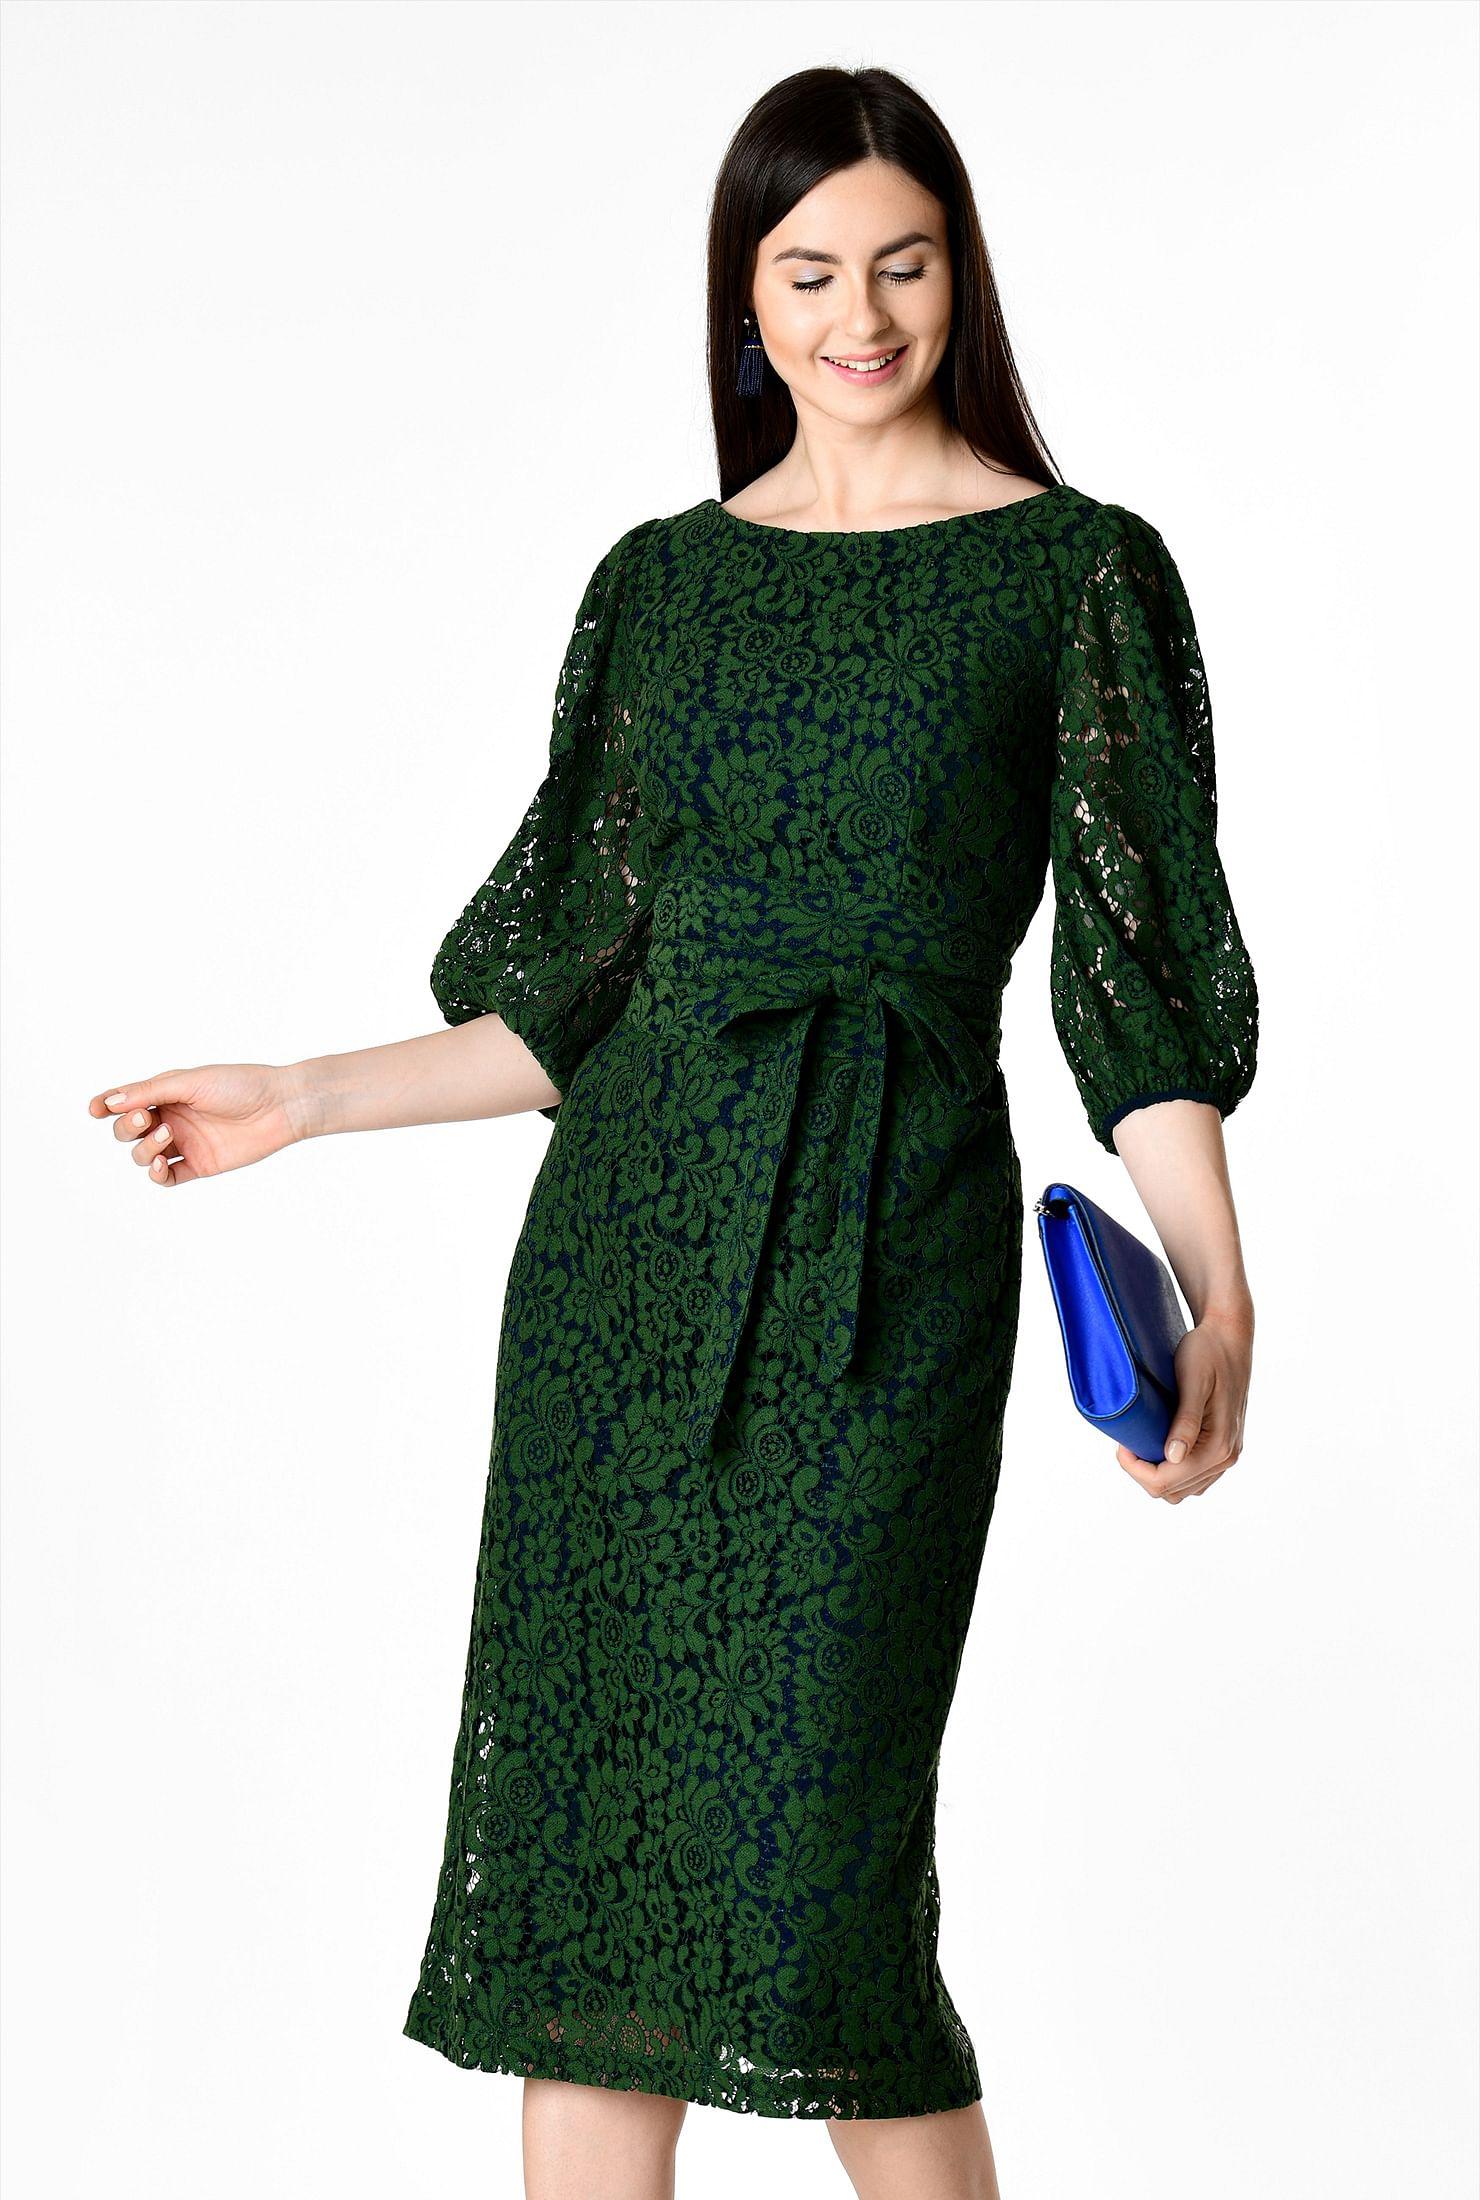 Womens Plus Size Petite Special Occasion Dresses | Saddha